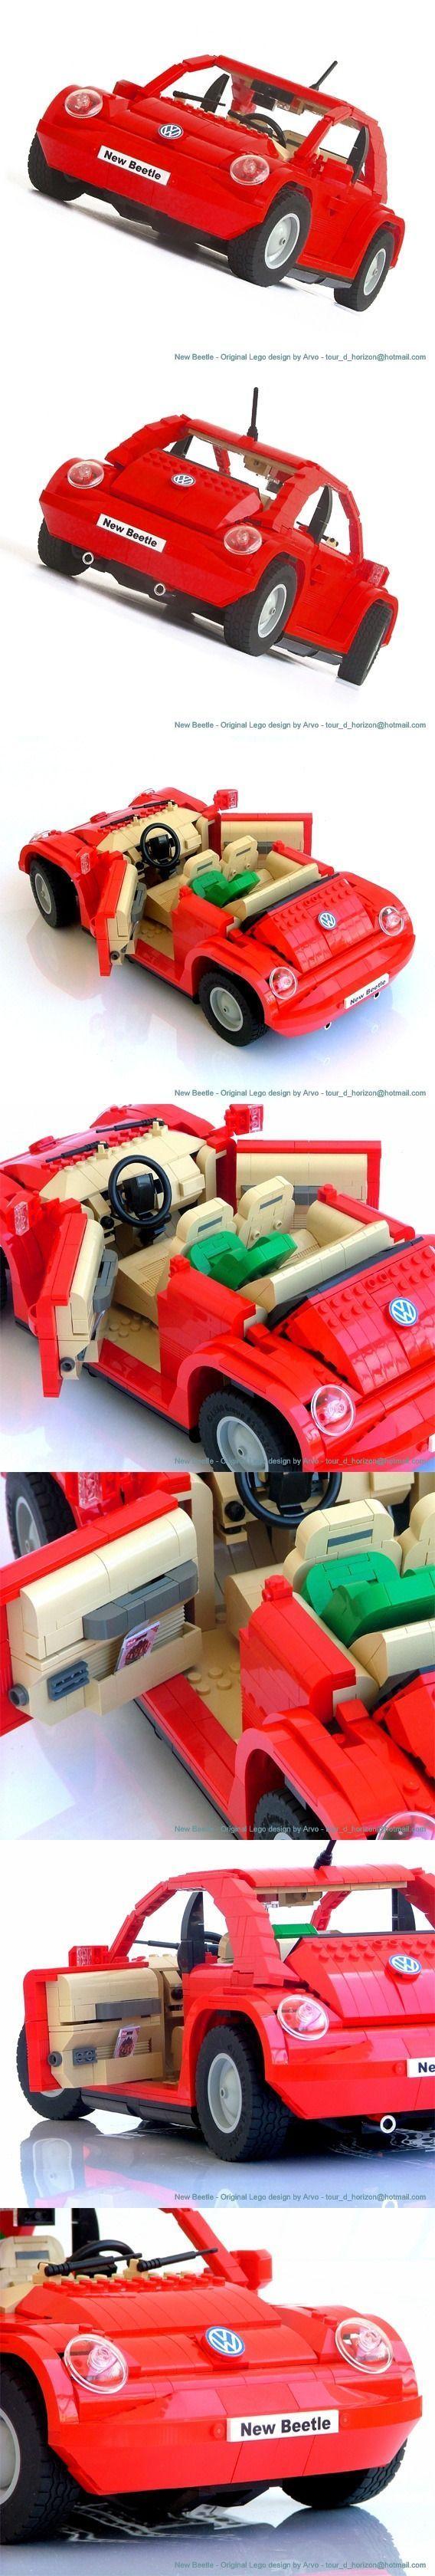 Awesome Volkswagen 2017 -  Awesome Volkswagen 2017: Brickshelf Gallery - Volkswagen New Beetle  LEGO Vehicl...  Cars World